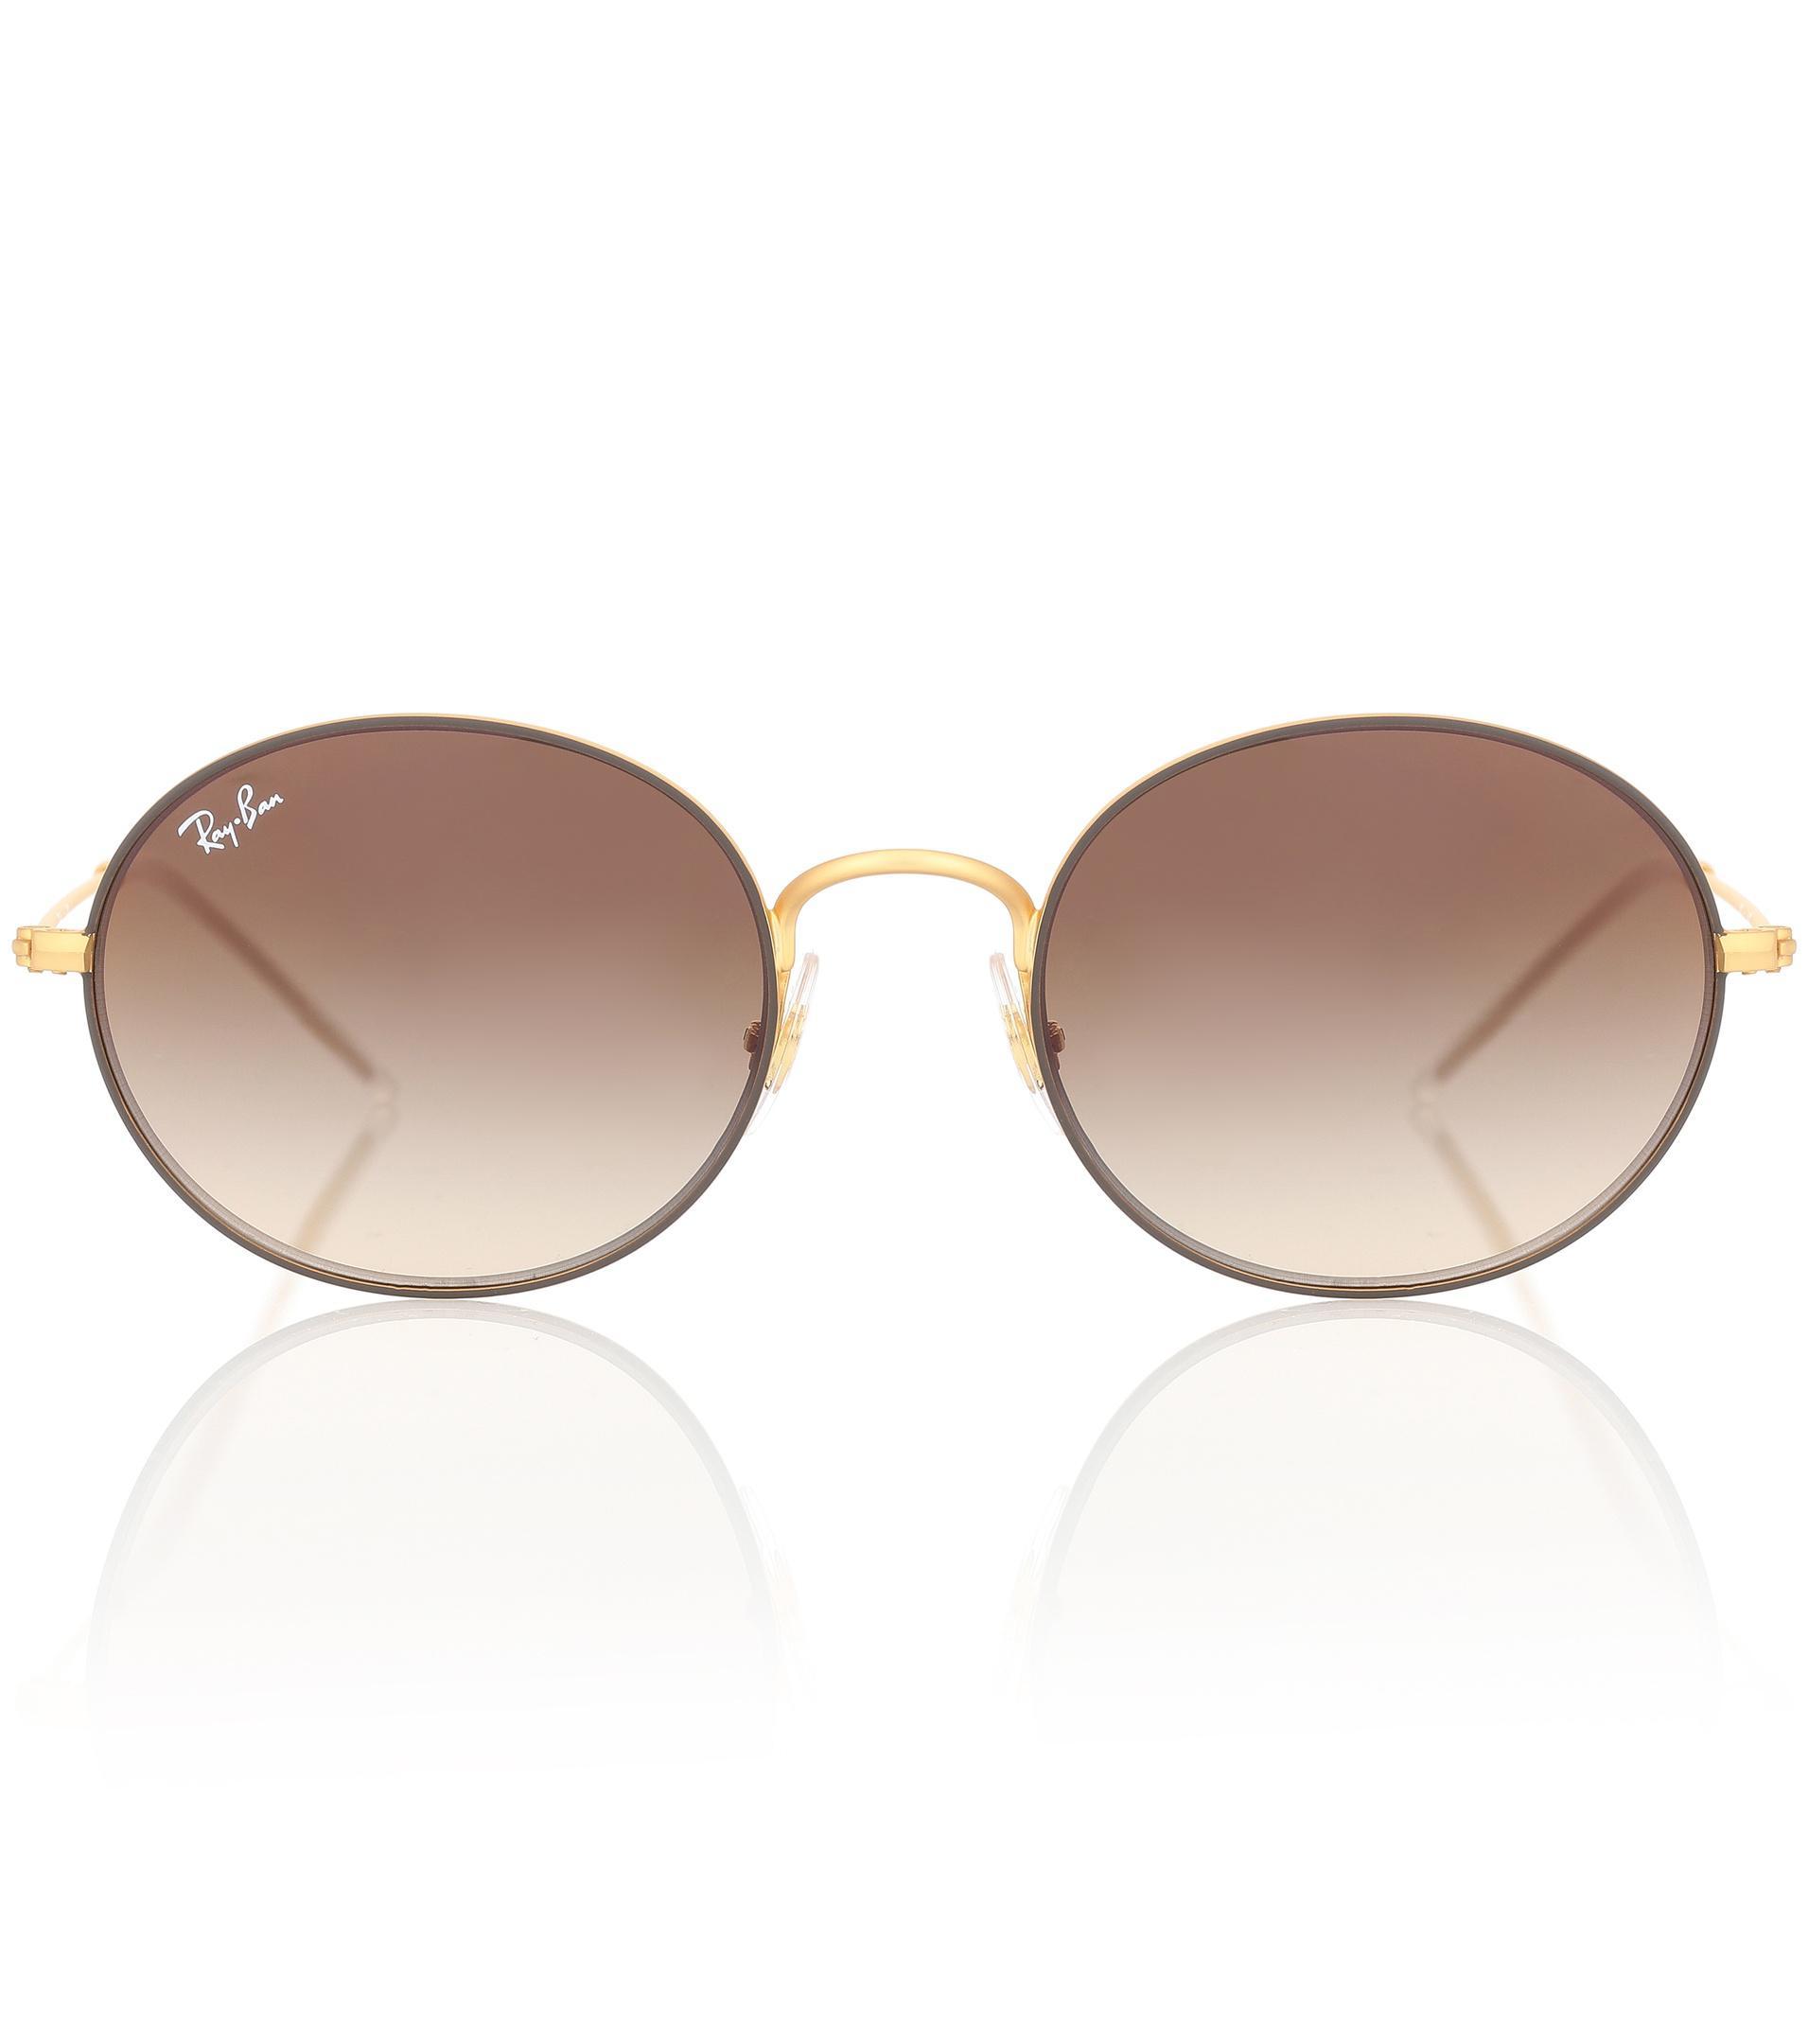 Ray-Ban Rb3594 Round Sunglasses in Metallic - Lyst cda0d9c769